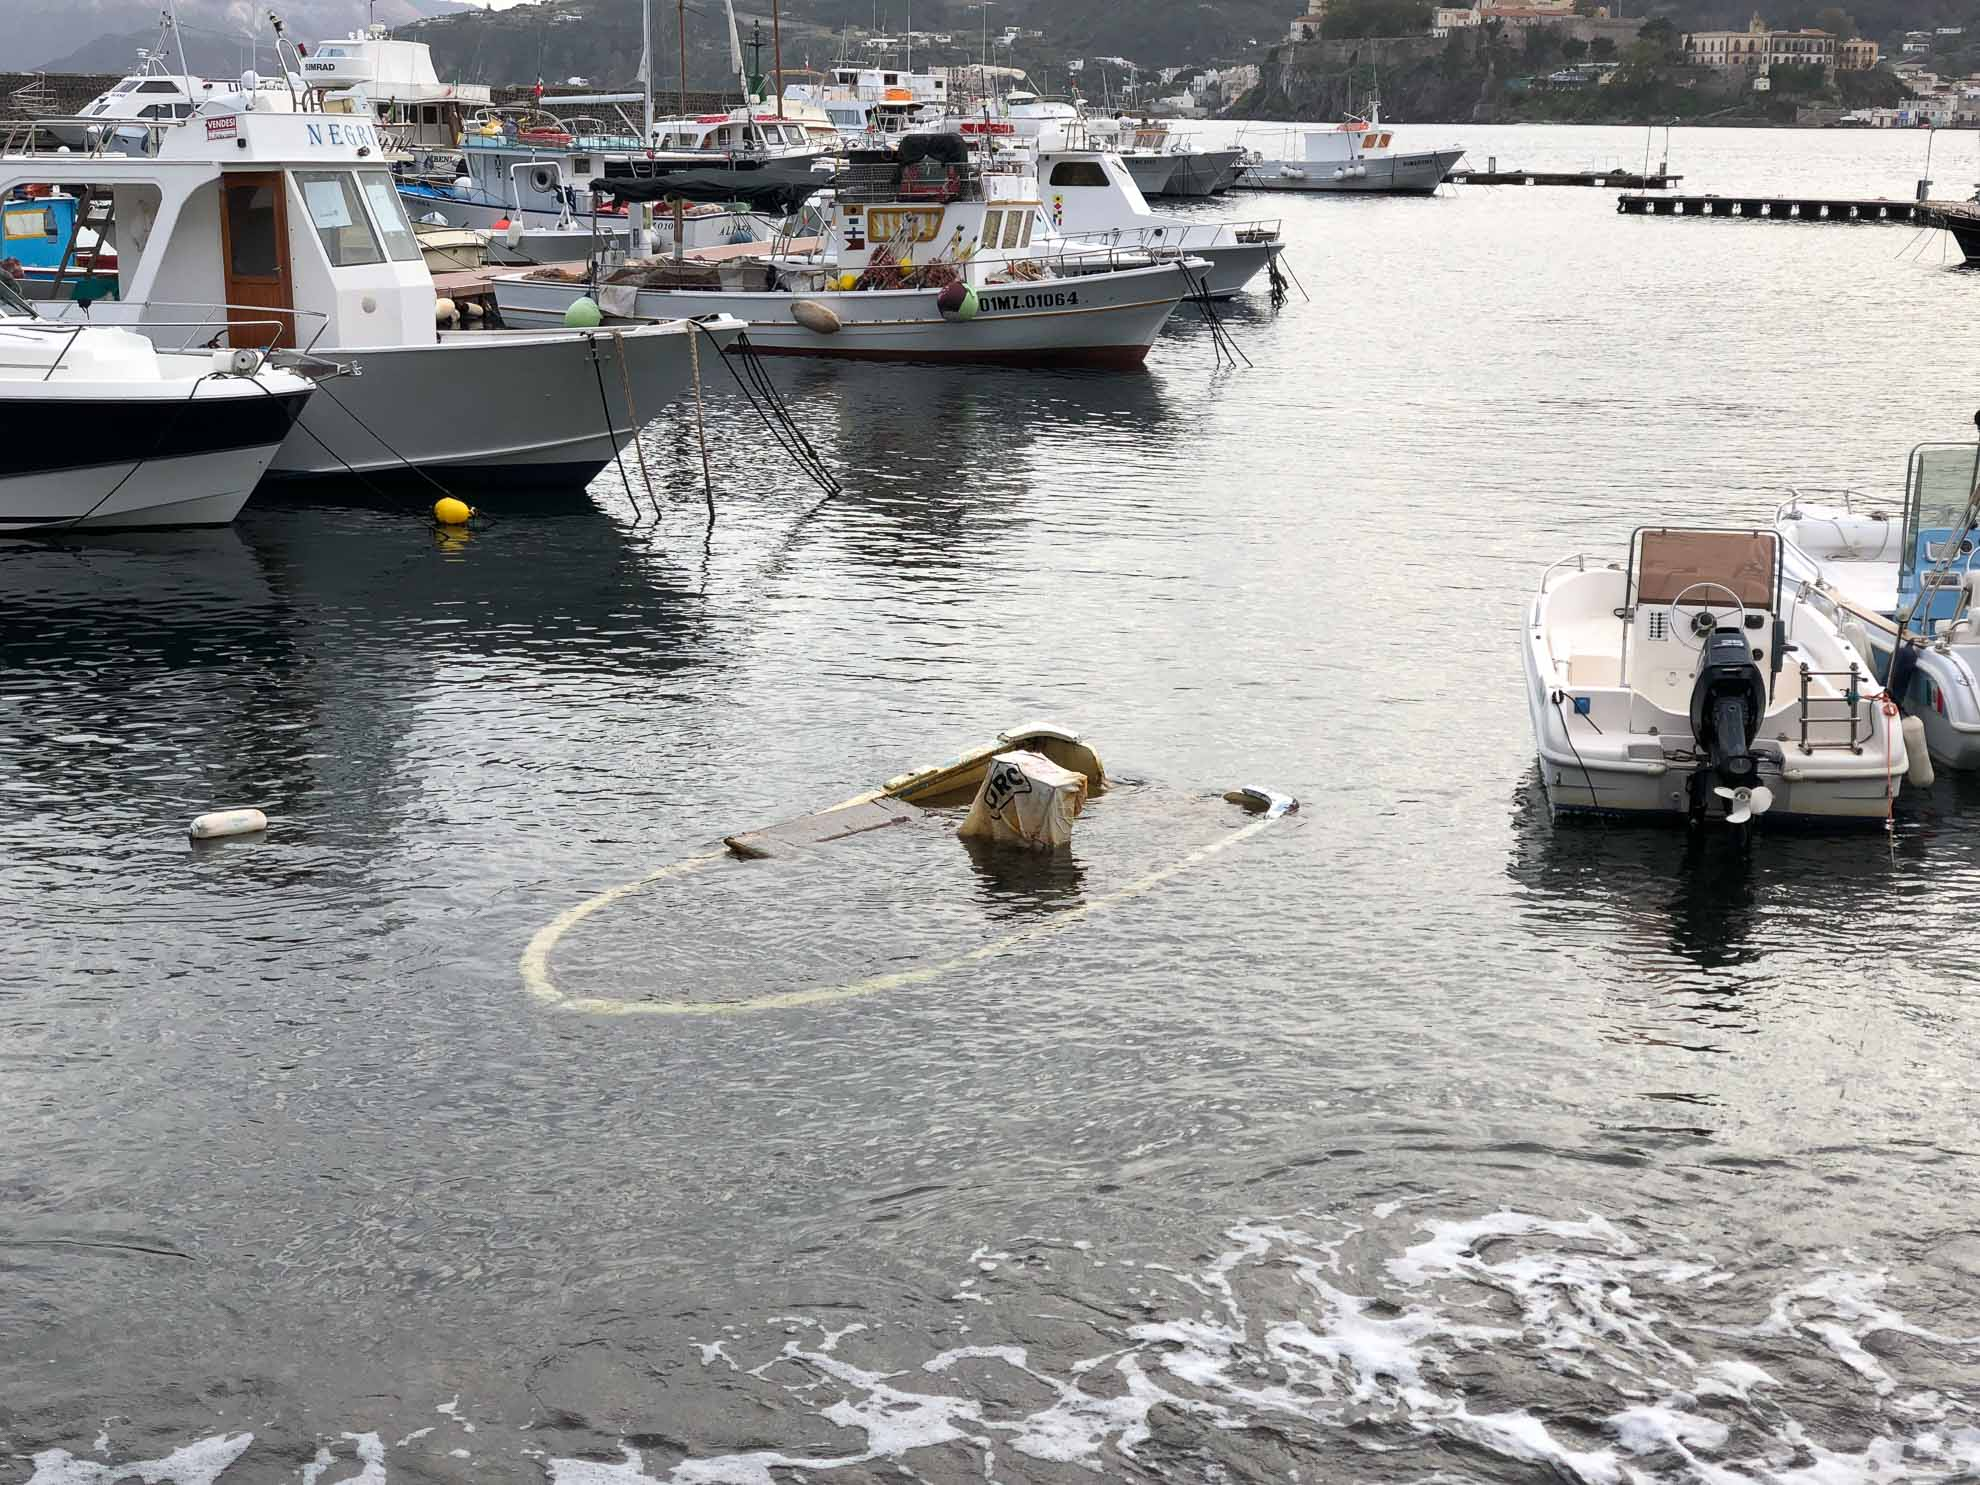 ... gesunkene Boote ...